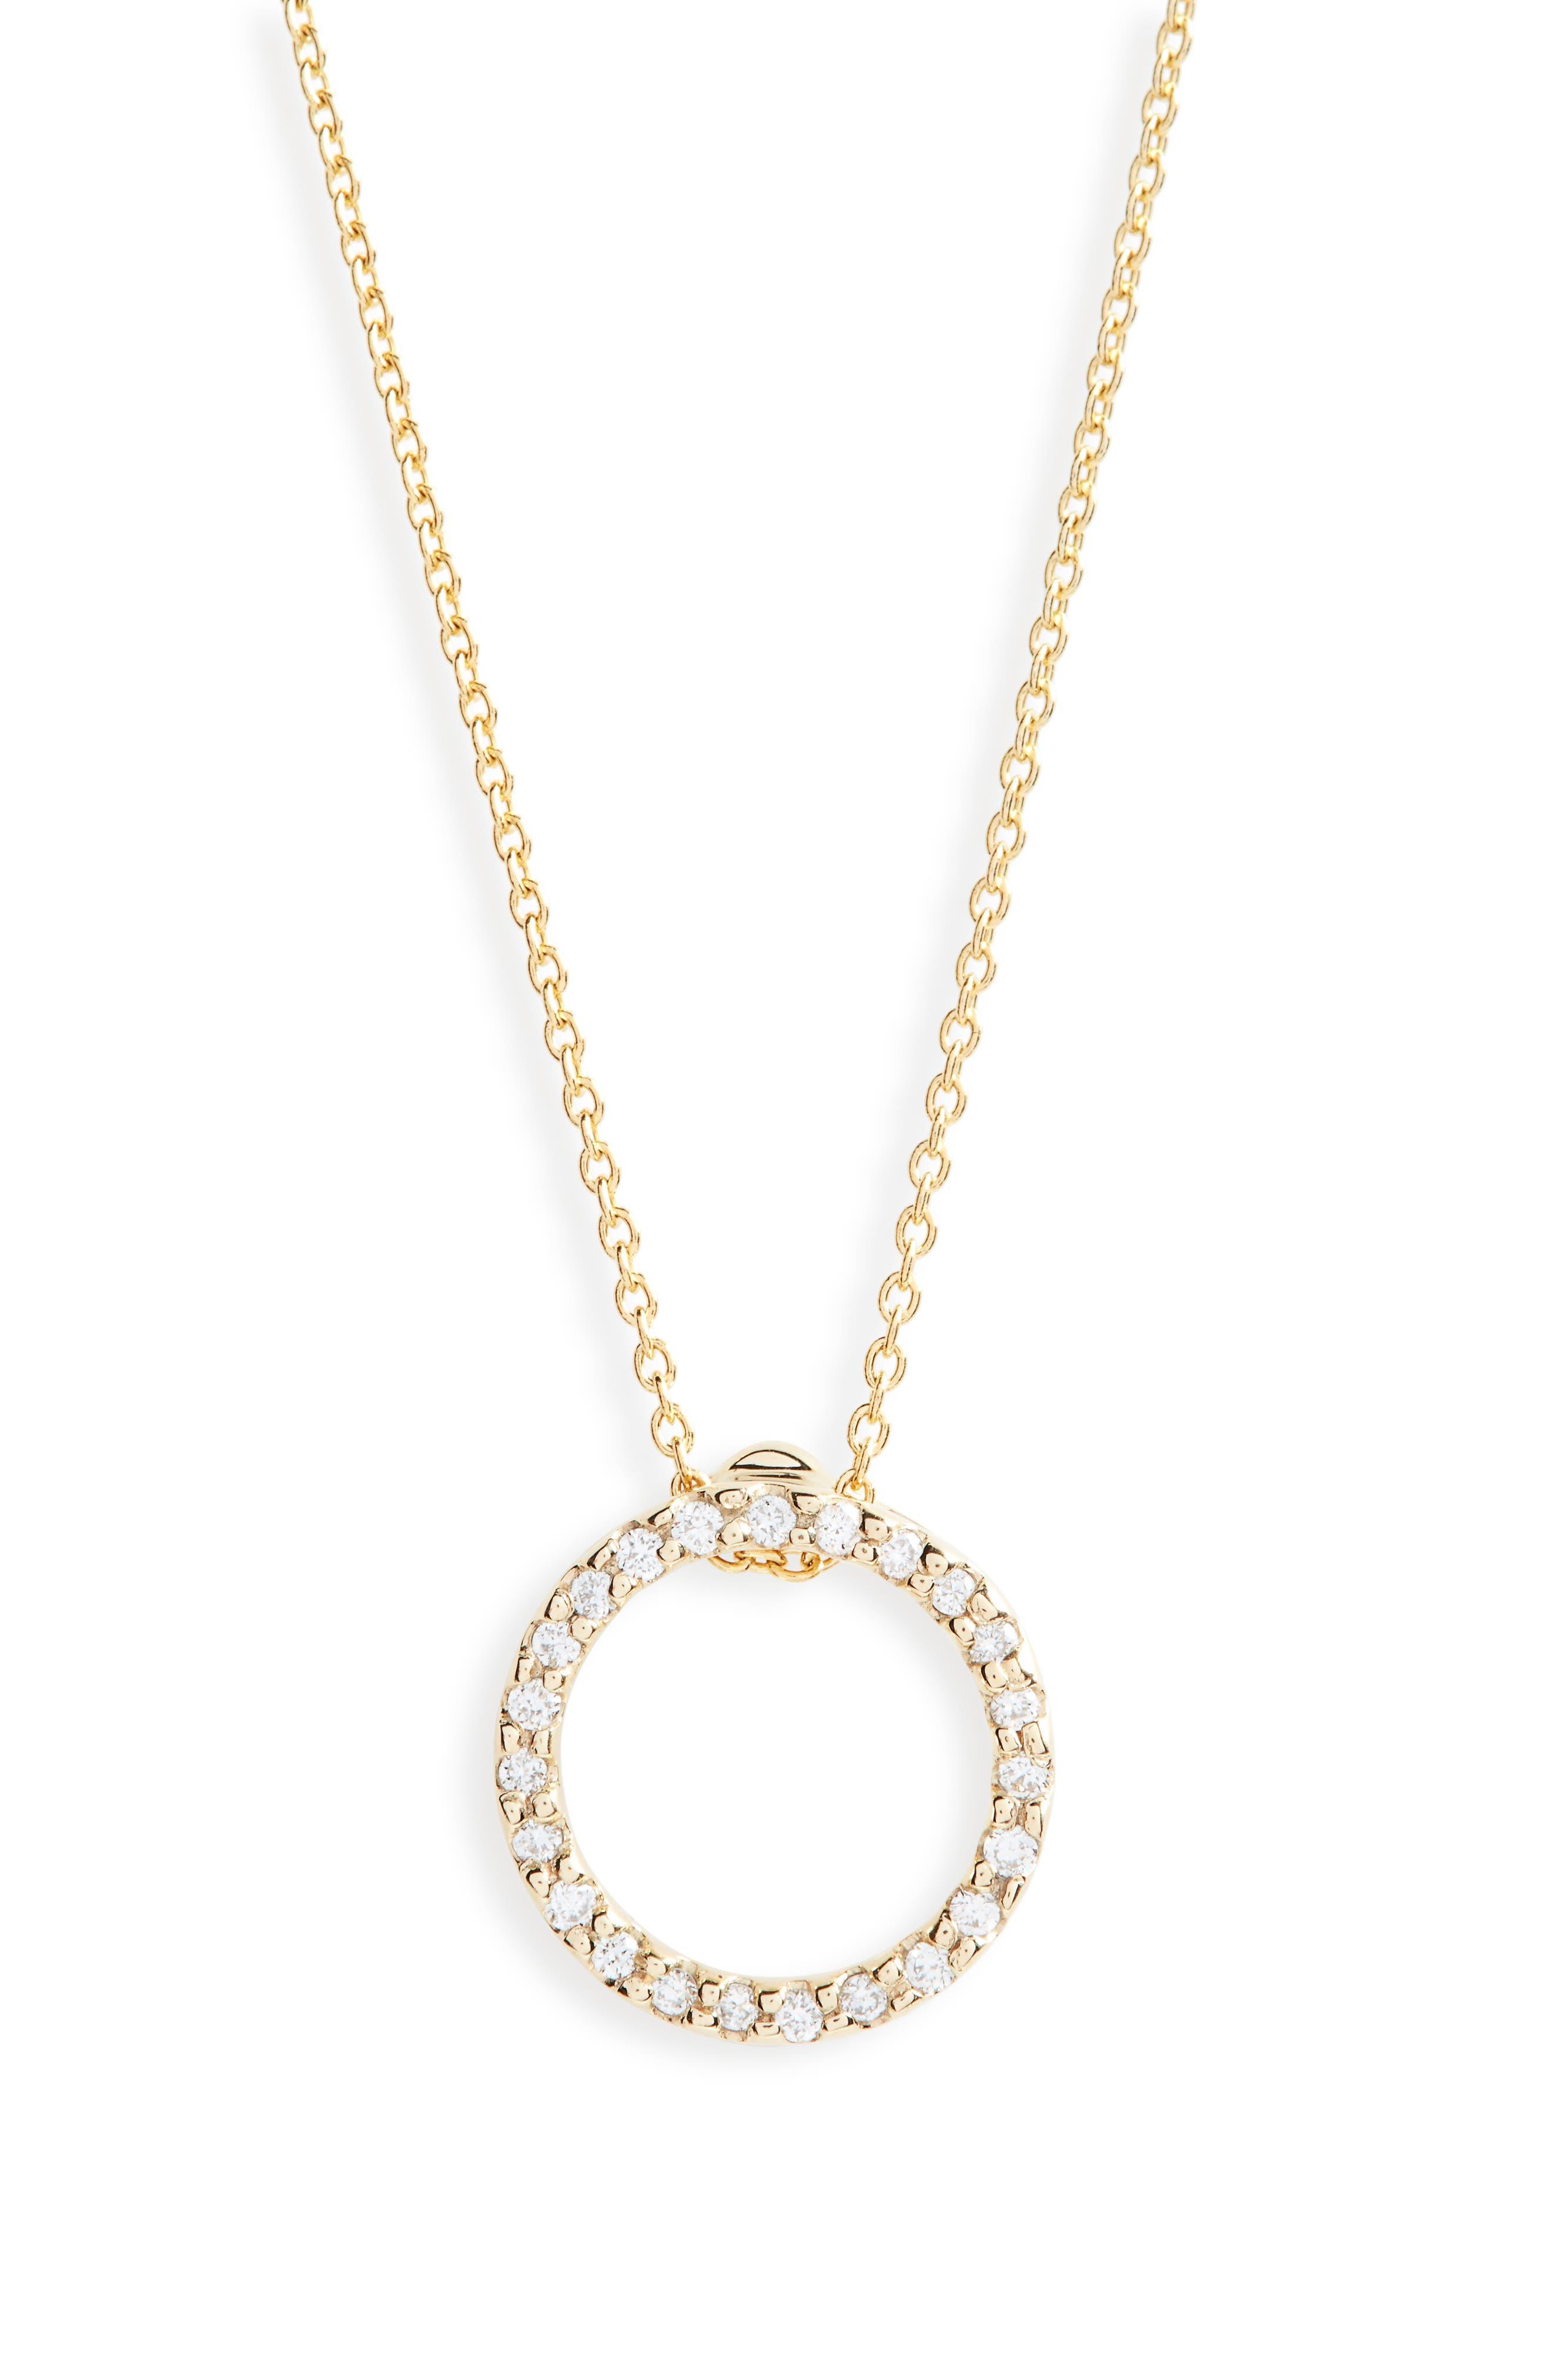 XS Diamond Pendant Necklace,                             Main thumbnail 1, color,                             D0.12 GHSI 18KYG